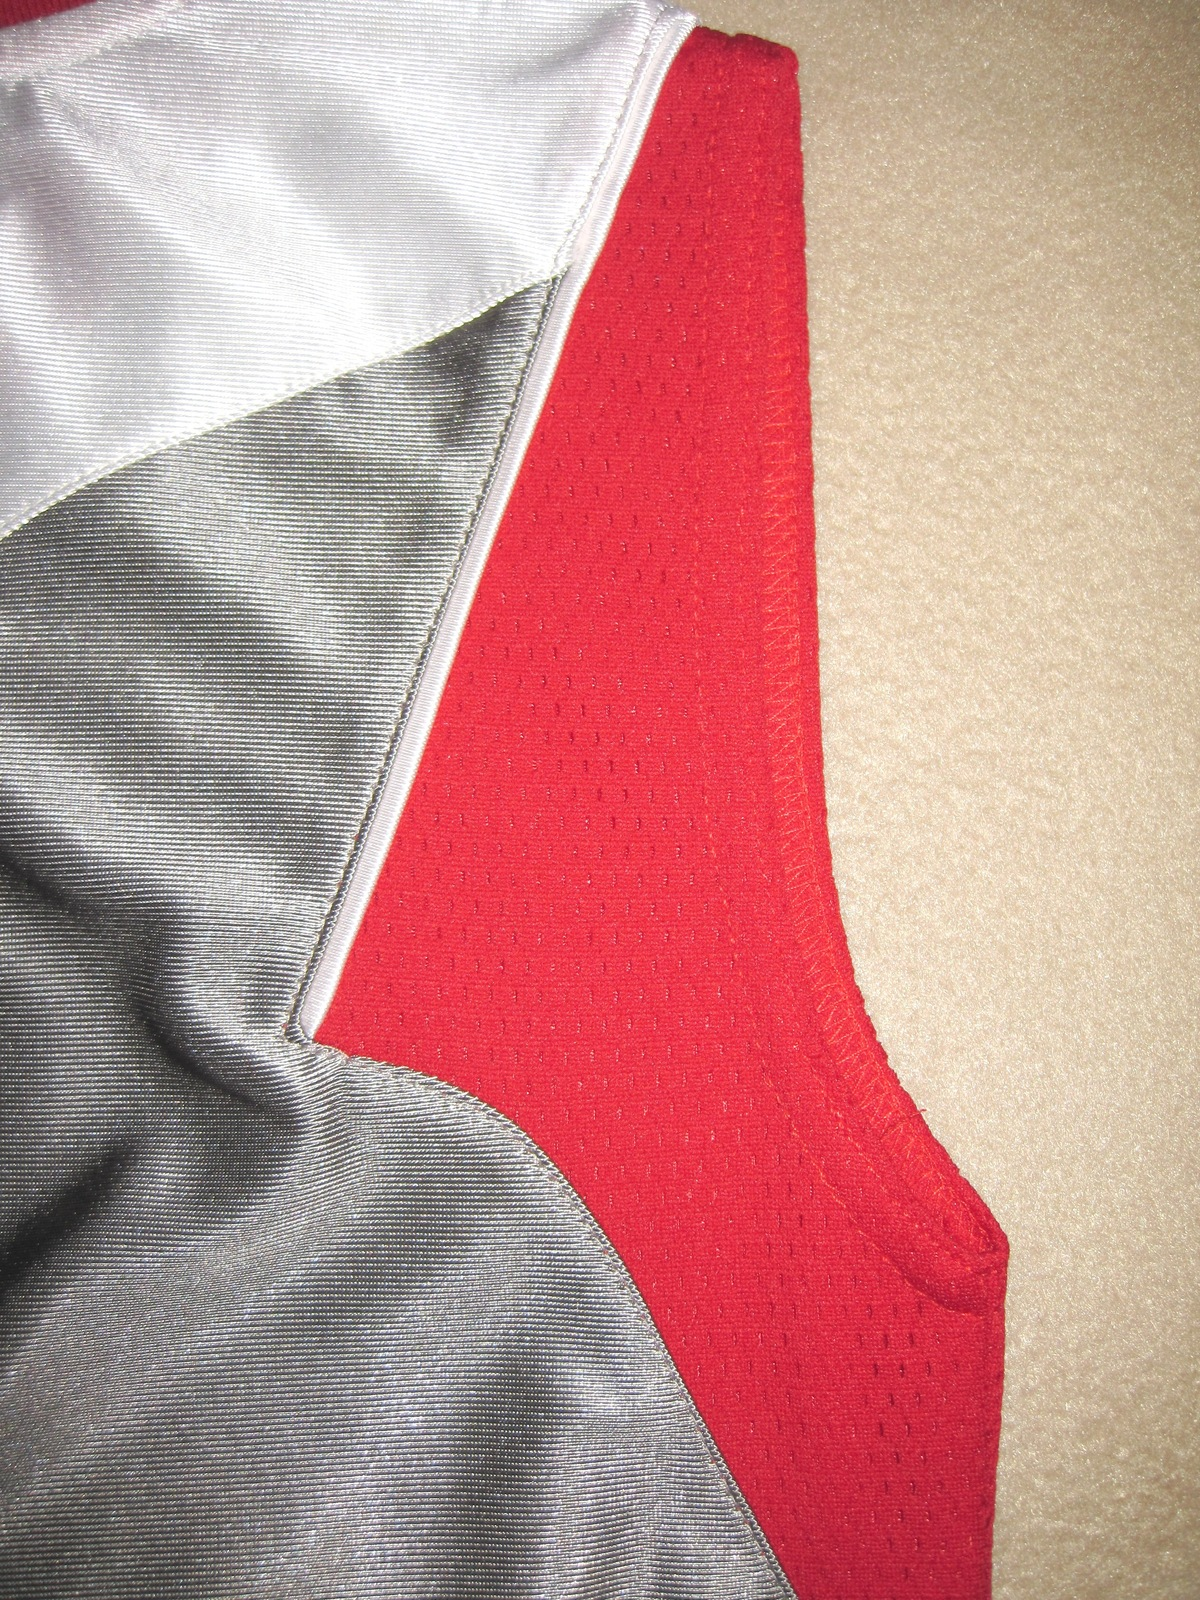 BOYS 7 - Nike - Flight Grey-Red-White BASKETBALL SPORTS JERSEY image 4